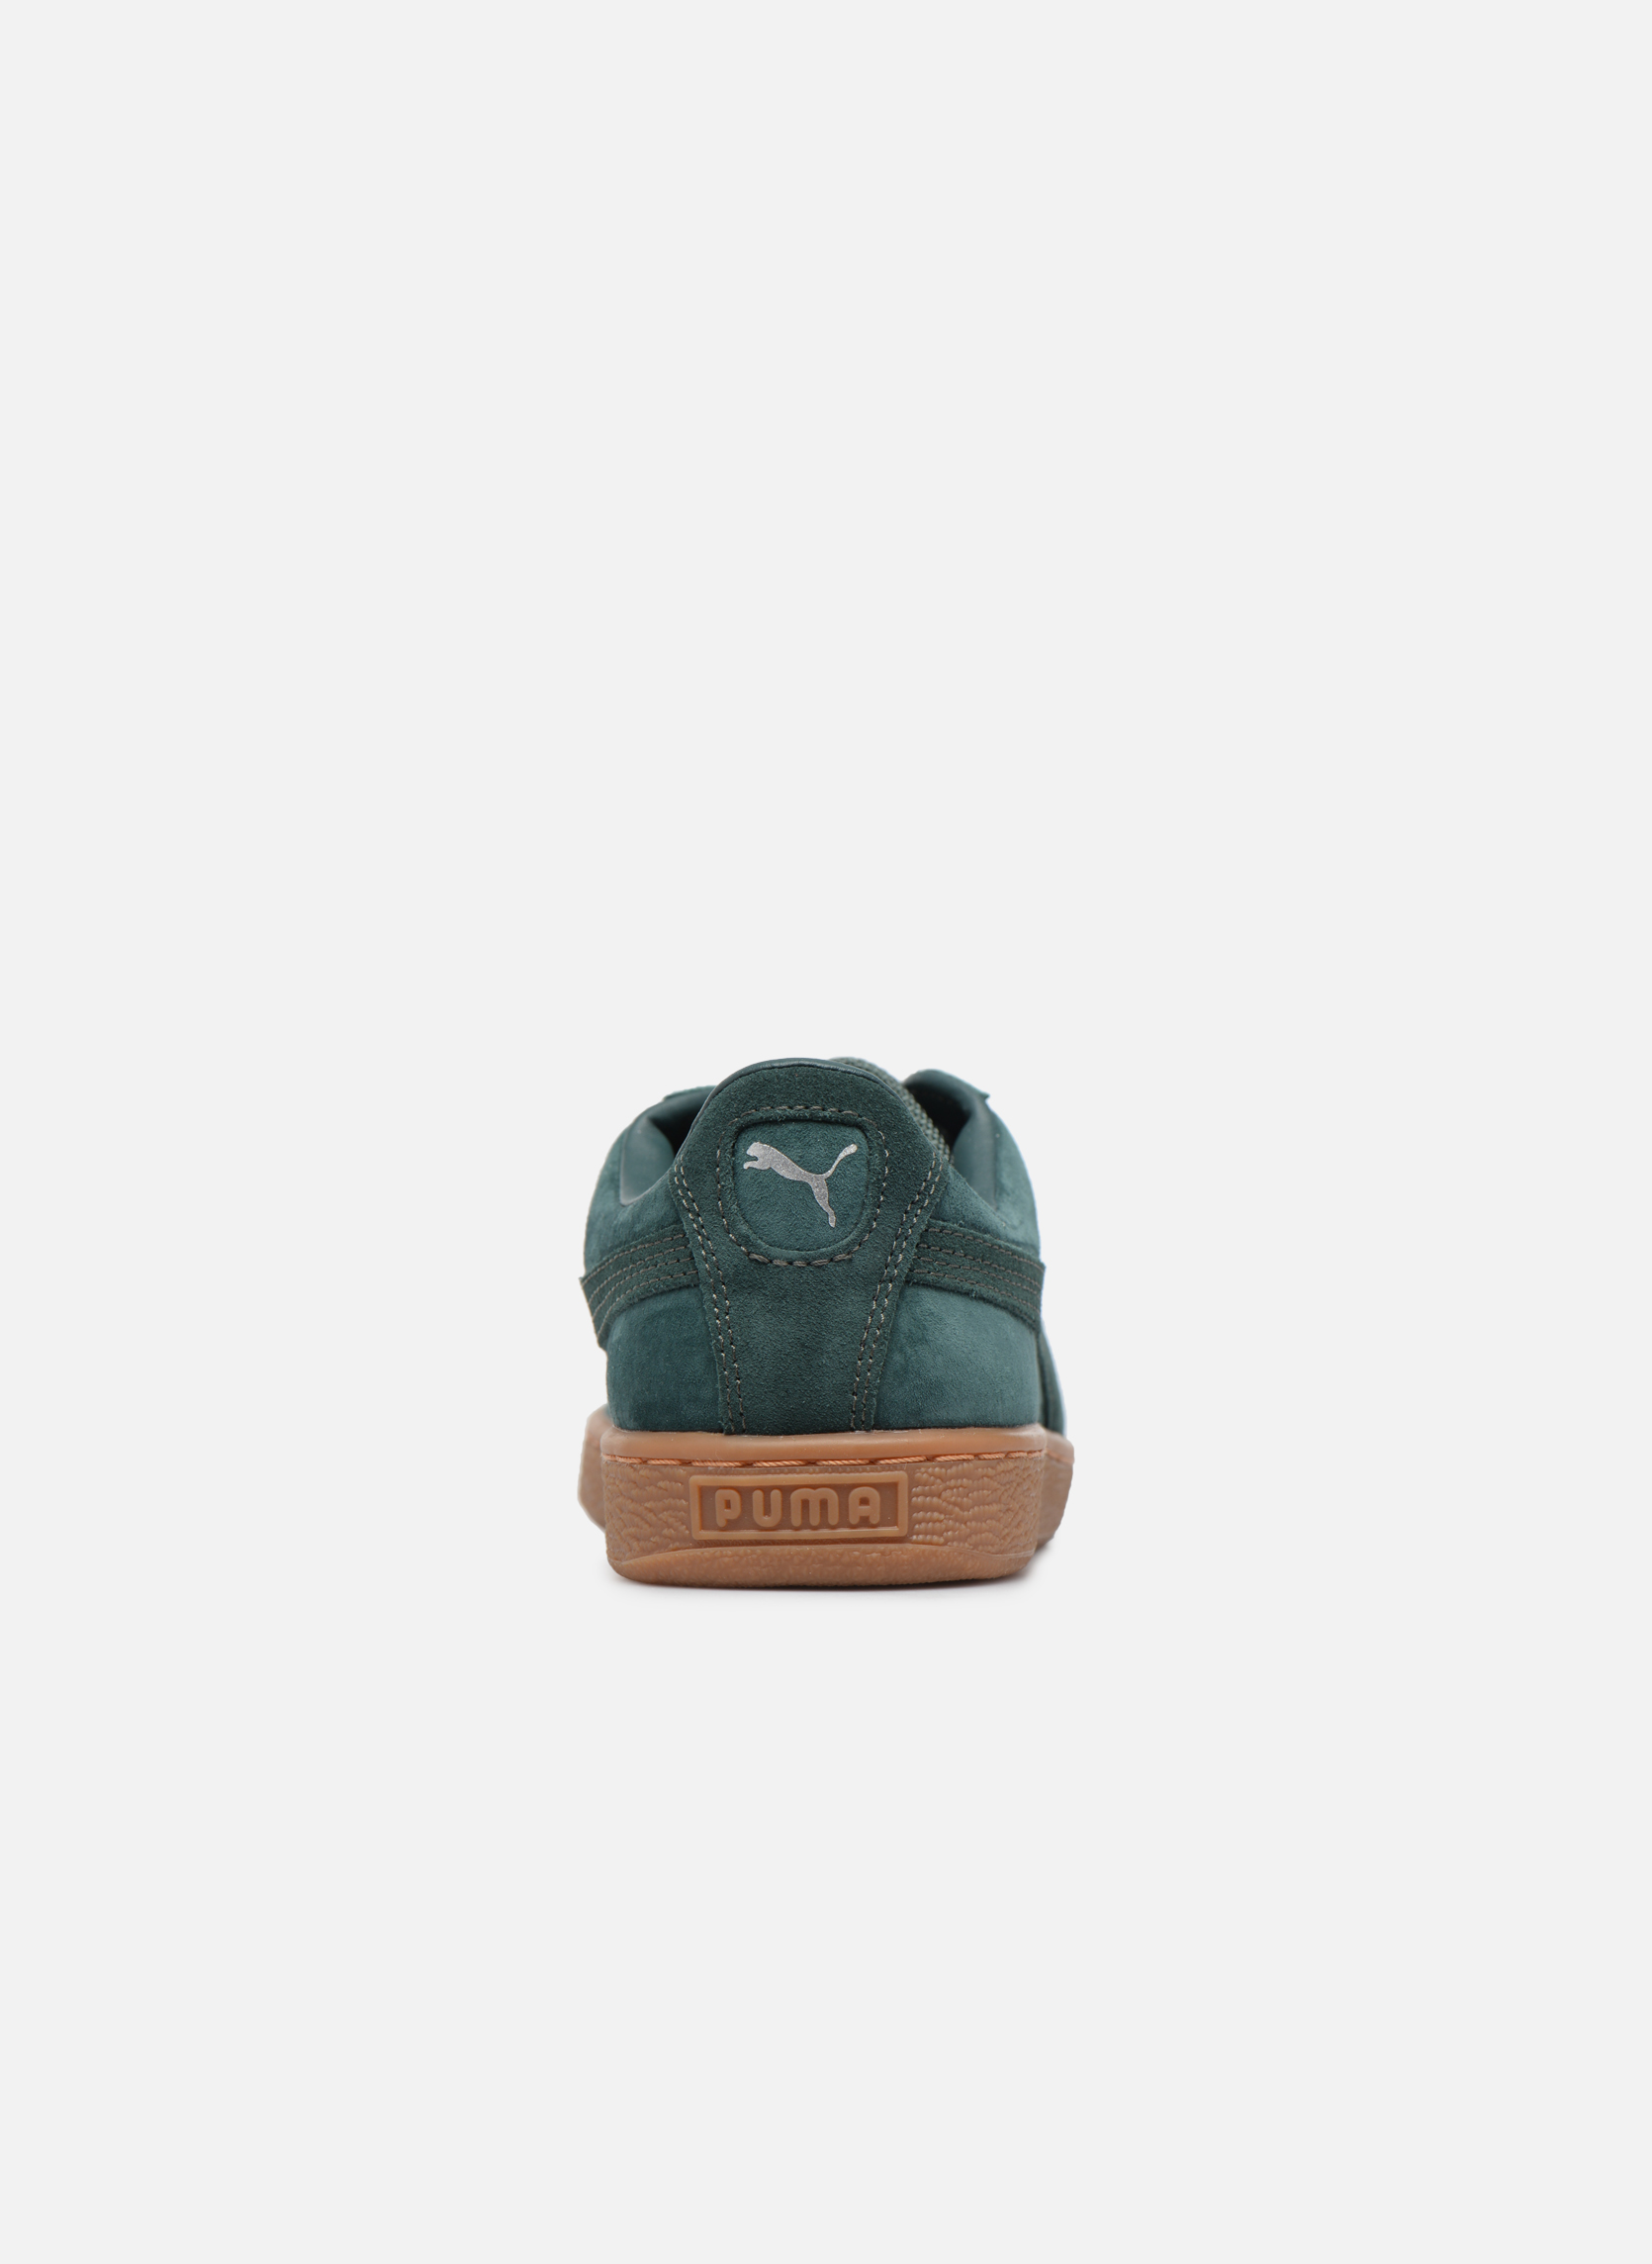 Puma Basket Weatherproof